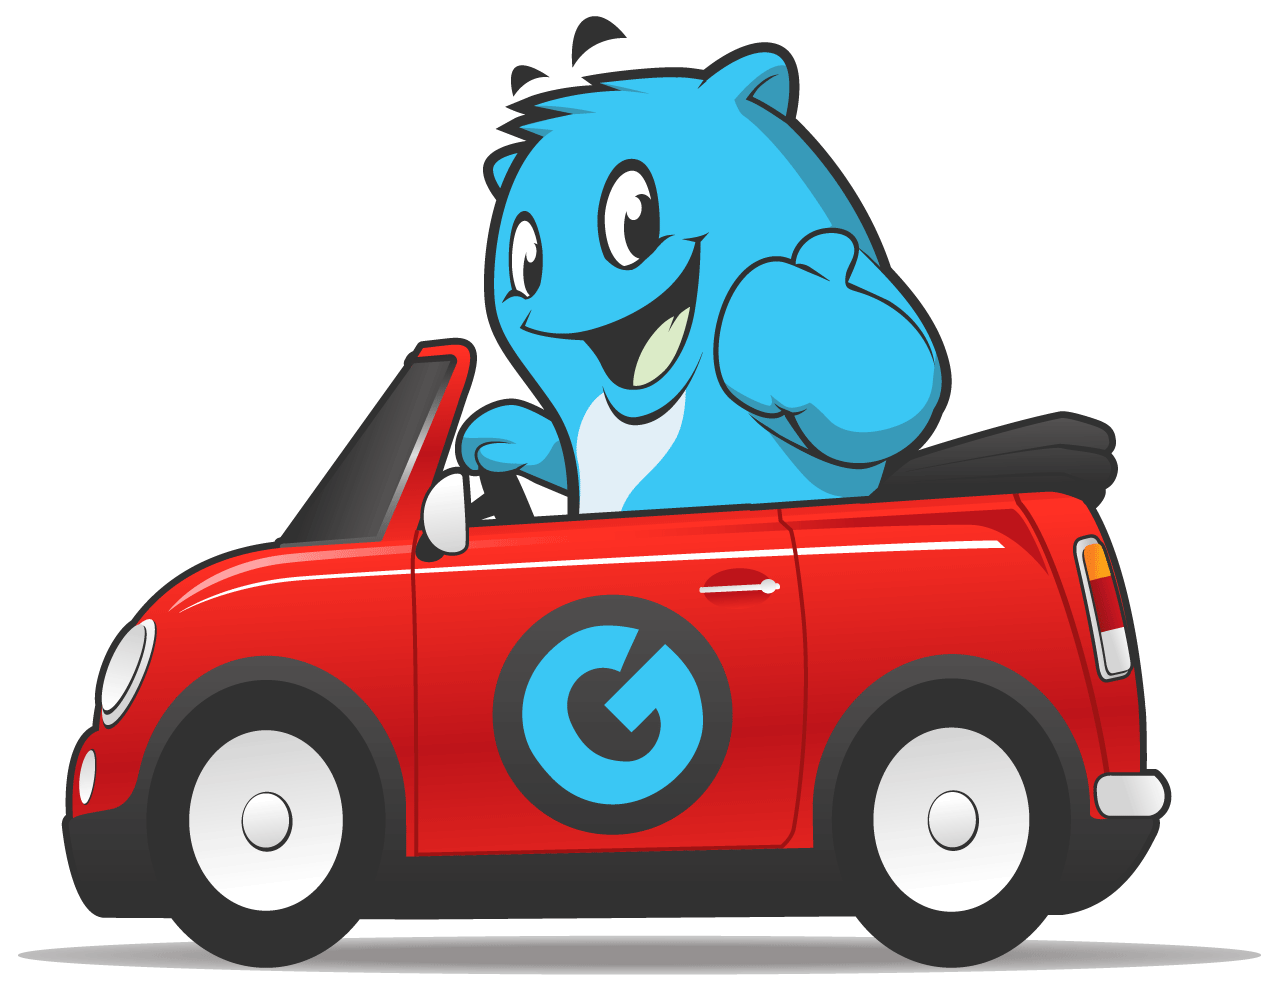 Driving A Car Png & Free Driving A Car.png Transparent Images #23504.